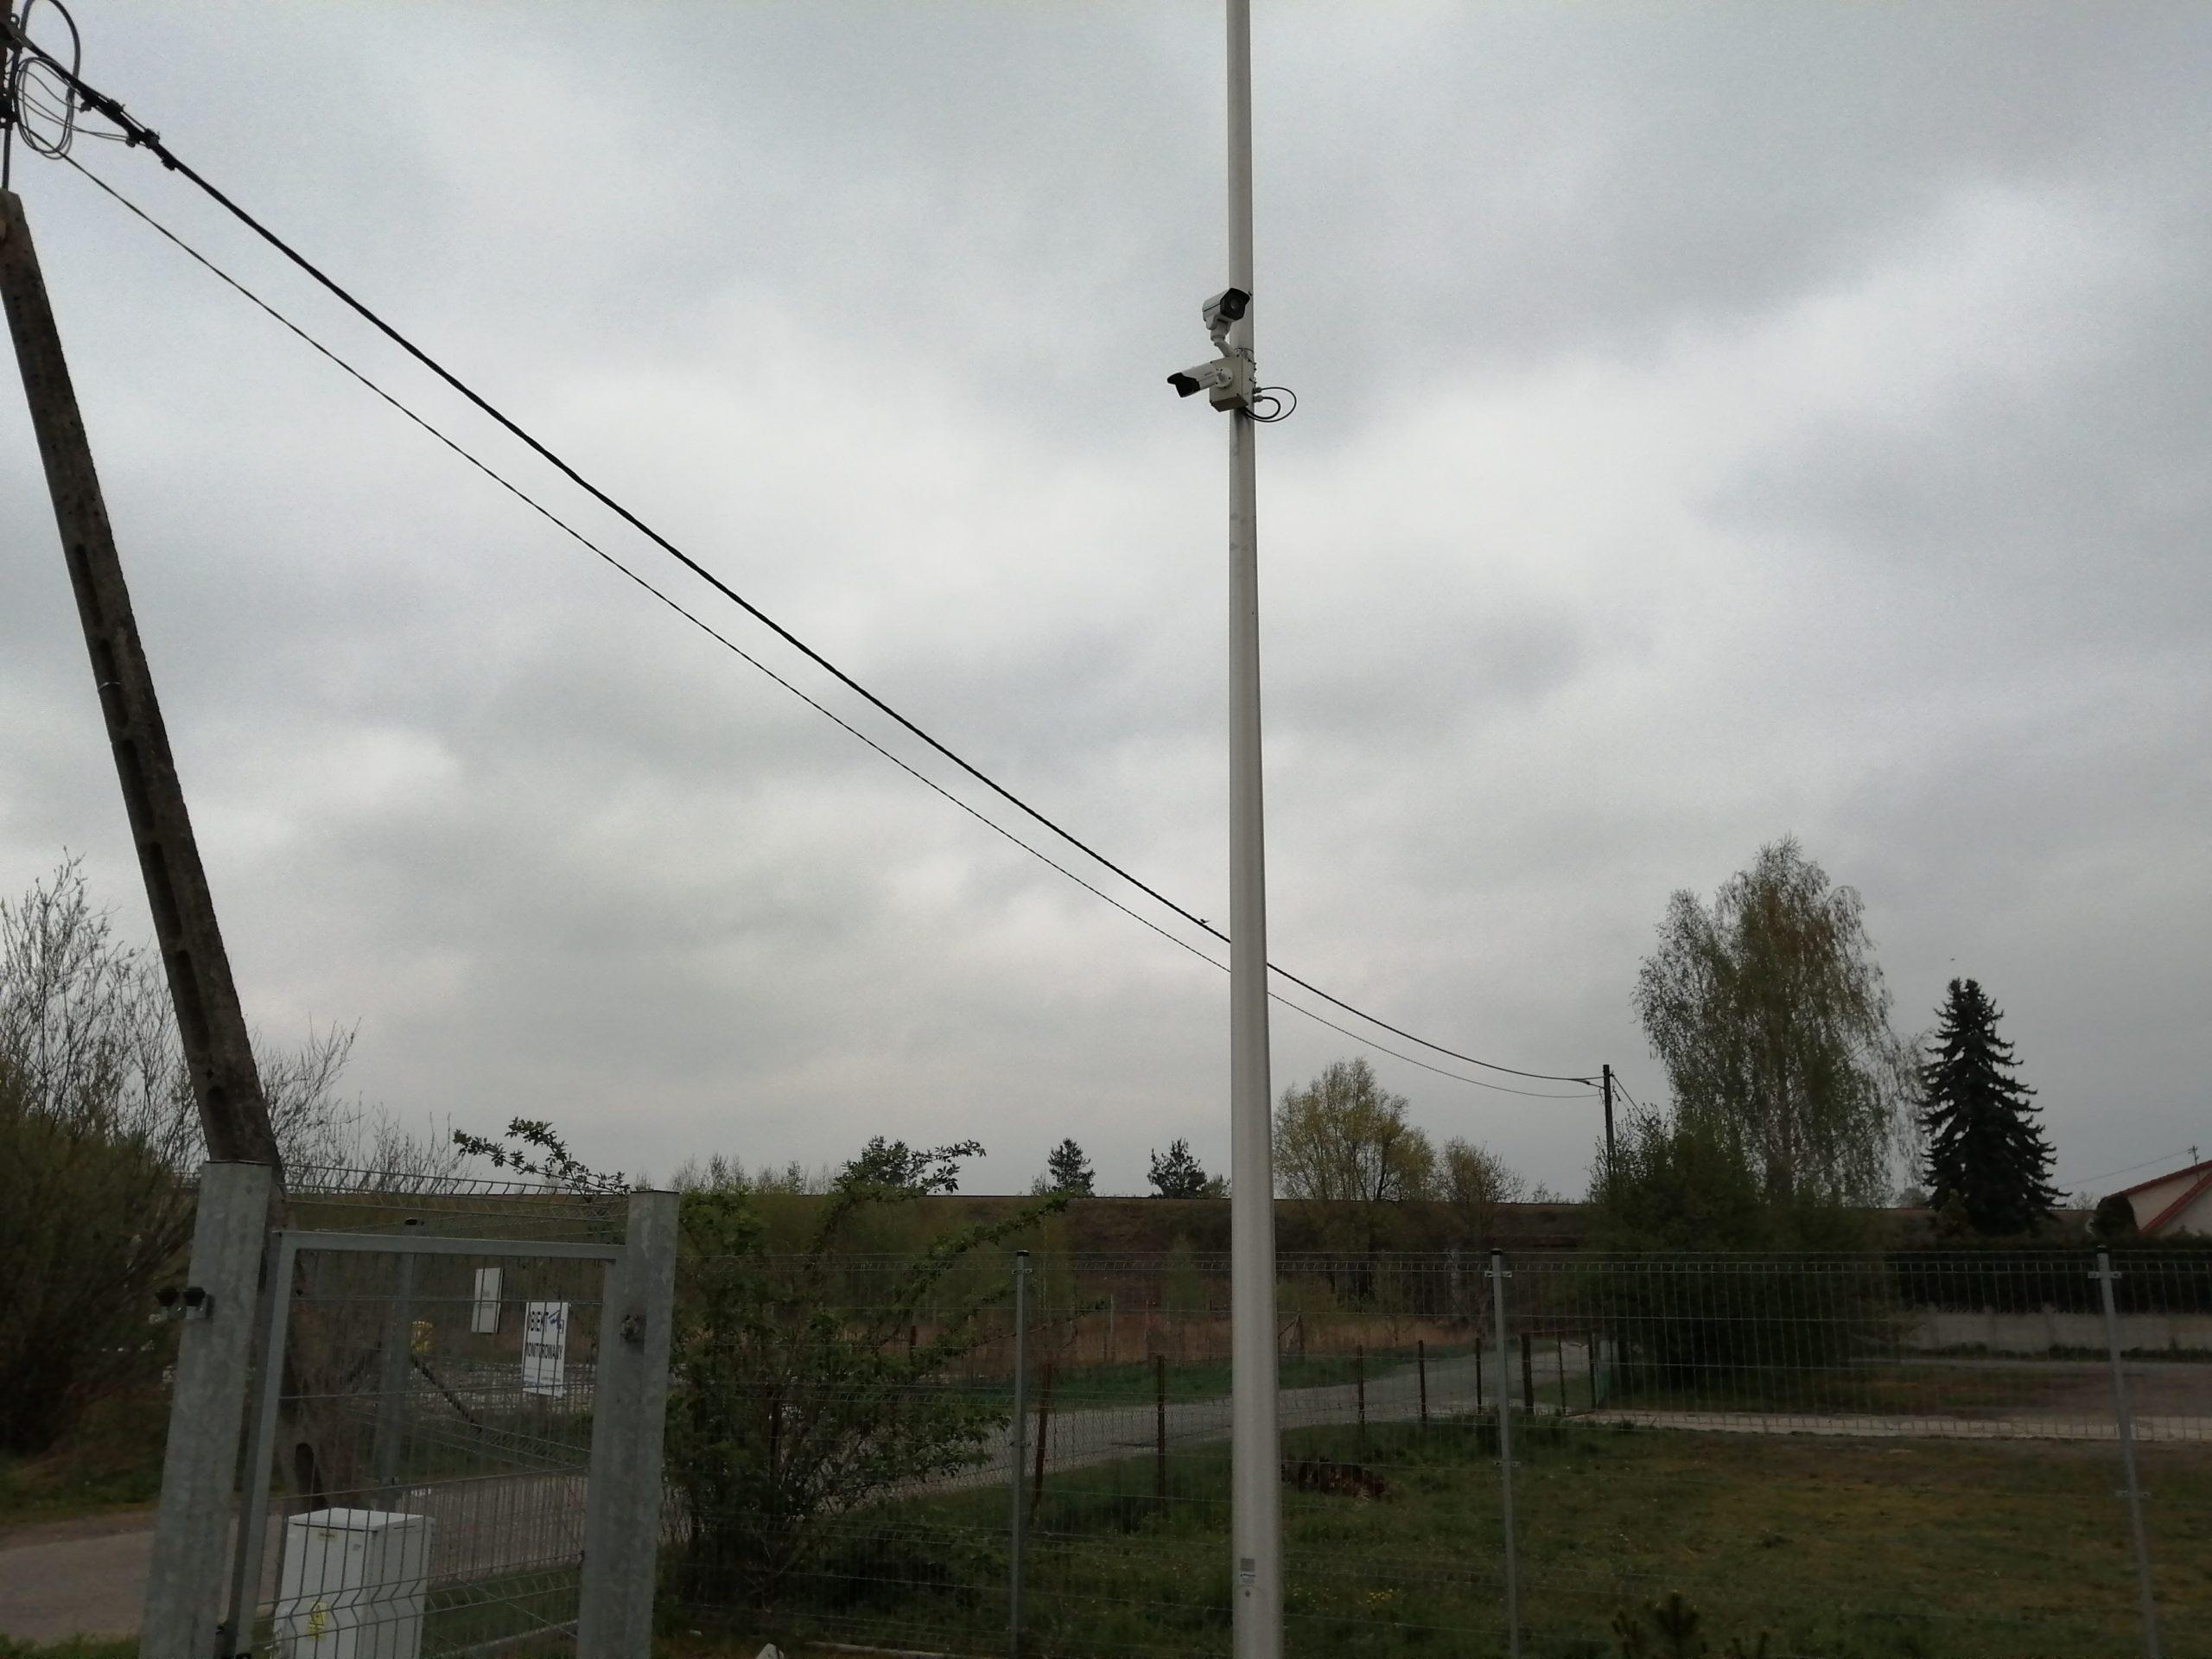 monitoring pszok w nisku monitoring wysypiska smieci Monitoirng Janów Lubelski Monitoirng biłgoraj infomech 4